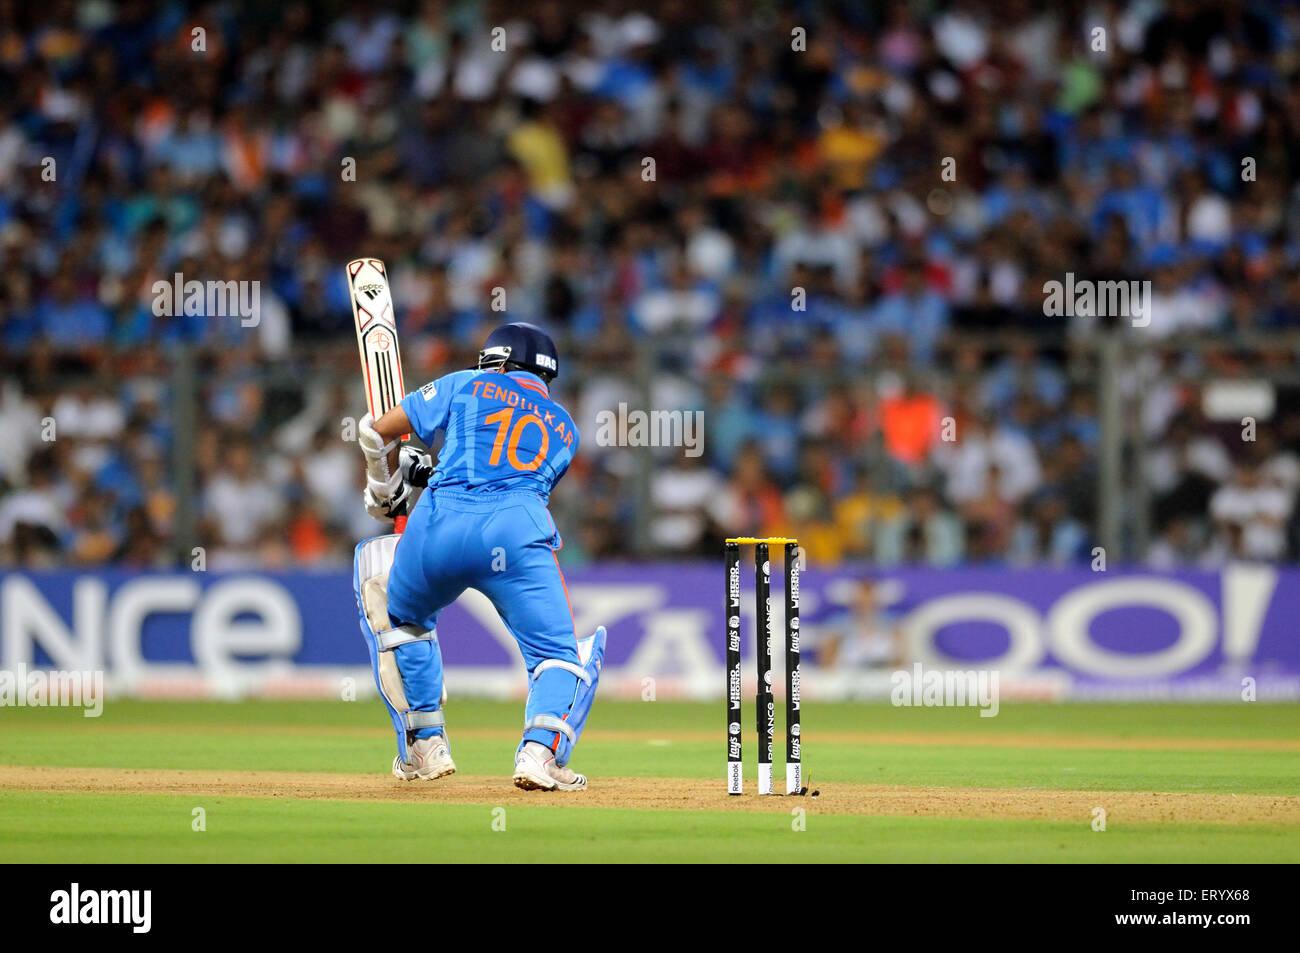 batsman Sachin Tendulkar 2011 ICC World Cup Final Sri Lanka Wankhede Stadium Mumbai - Stock Image